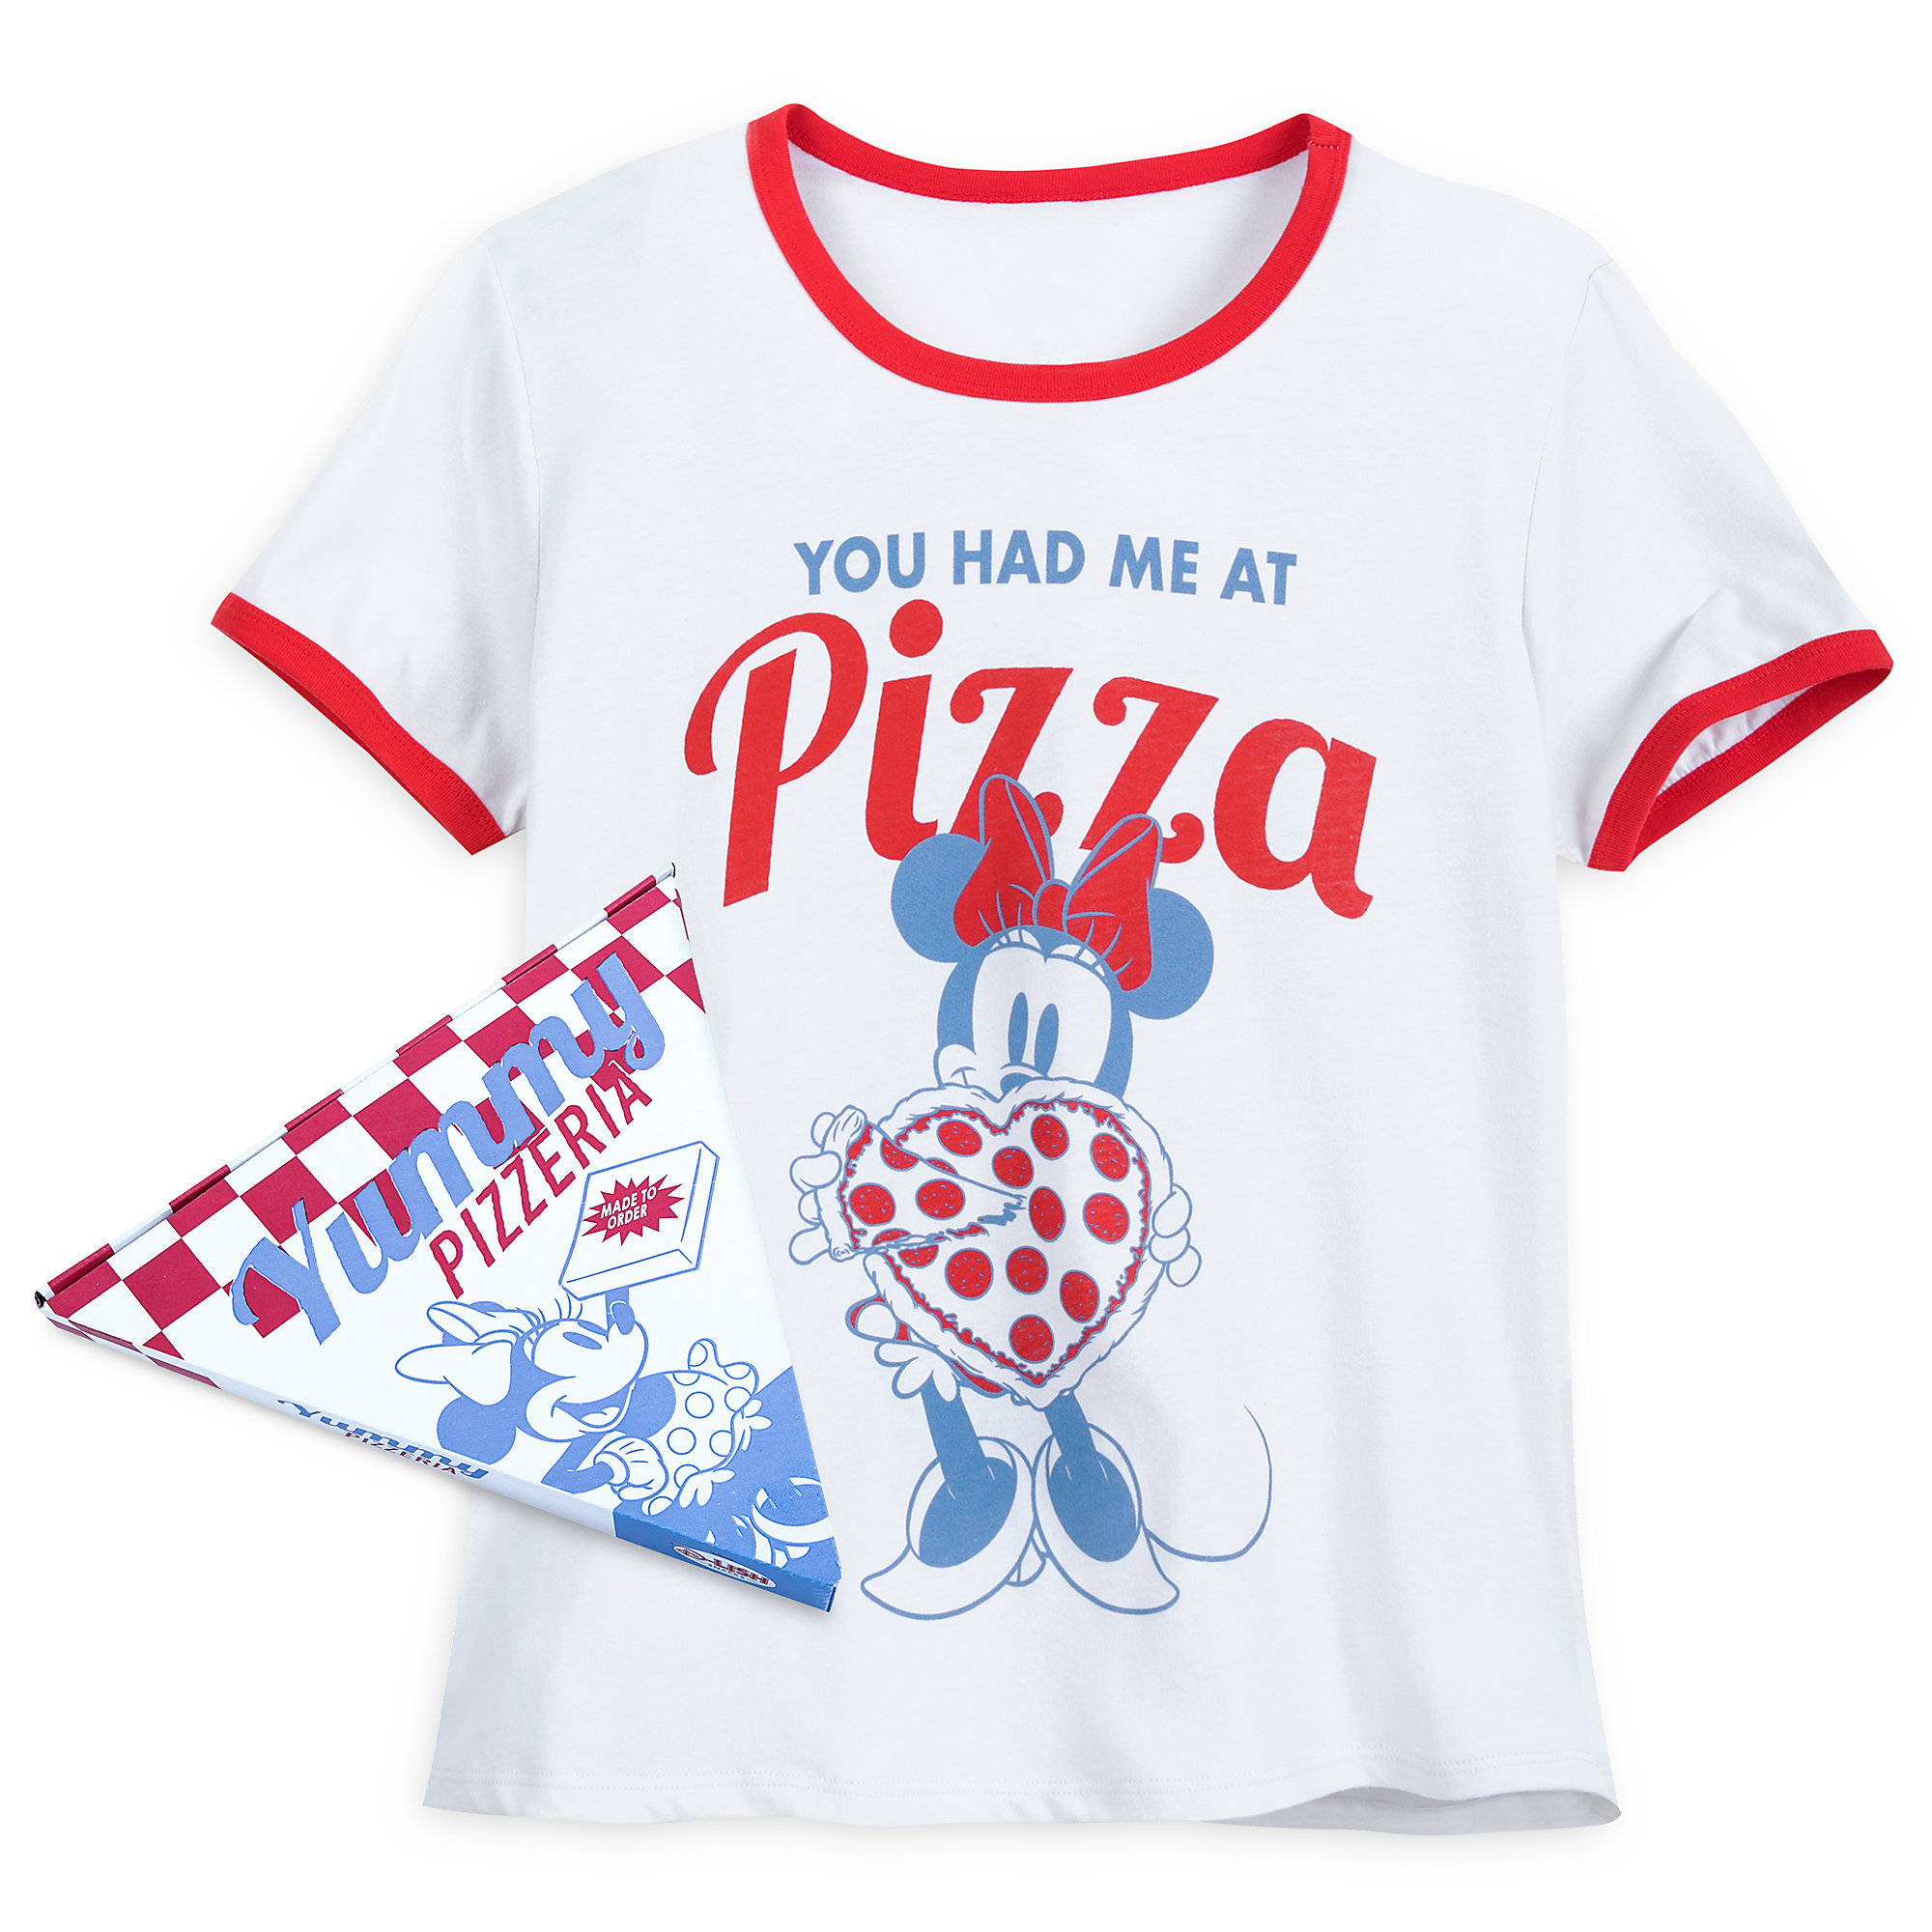 87dd0cc19 Pizza Is My Crack T-shirt, Womens Ladies Mens Unisex, Pizza T-shirt, Pizza  Graphic Tee, Funny Food T-shirt, Short & Long Sleeve T-shirt .